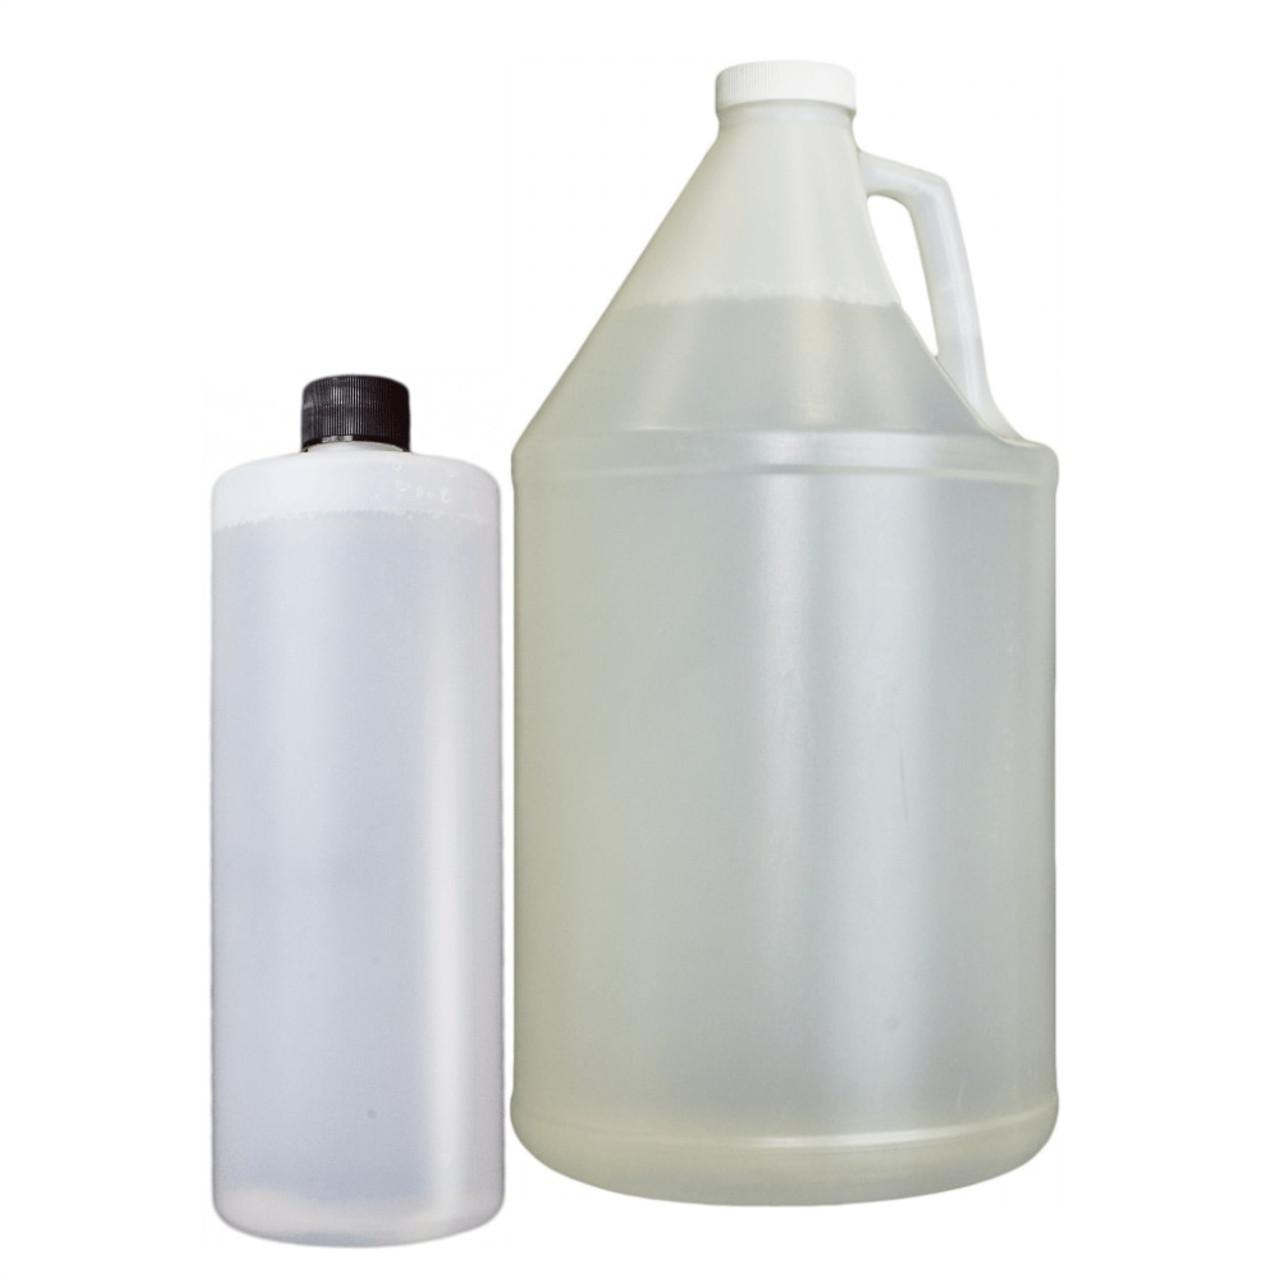 Cyclomethicone Silicone Fluid Quart